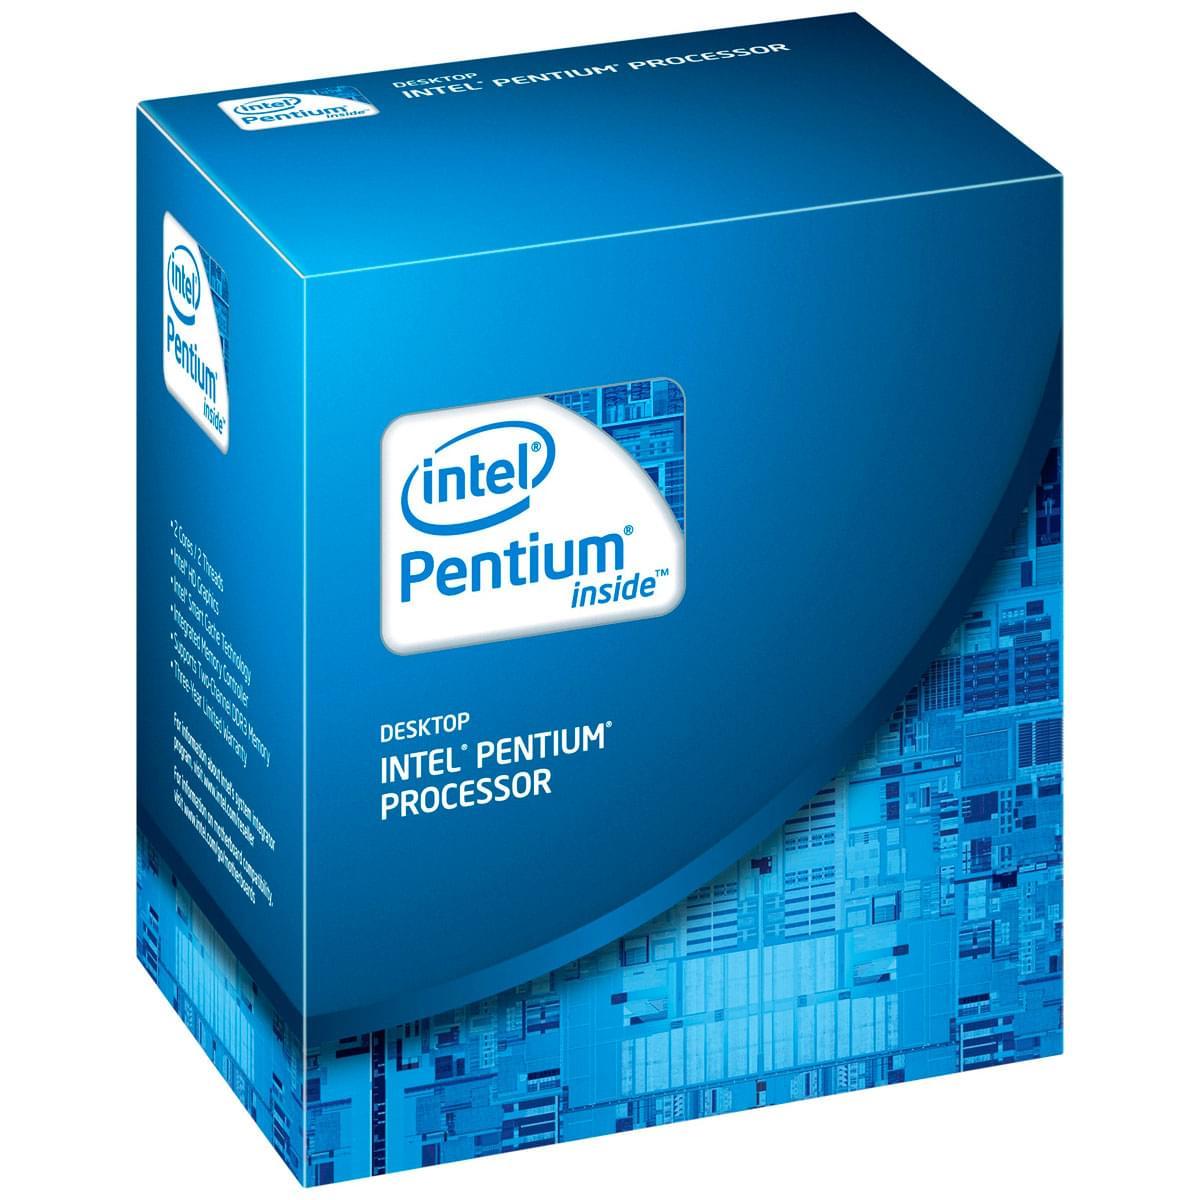 Processeur Intel Pentium G620 - 2.6GHz -  - 0